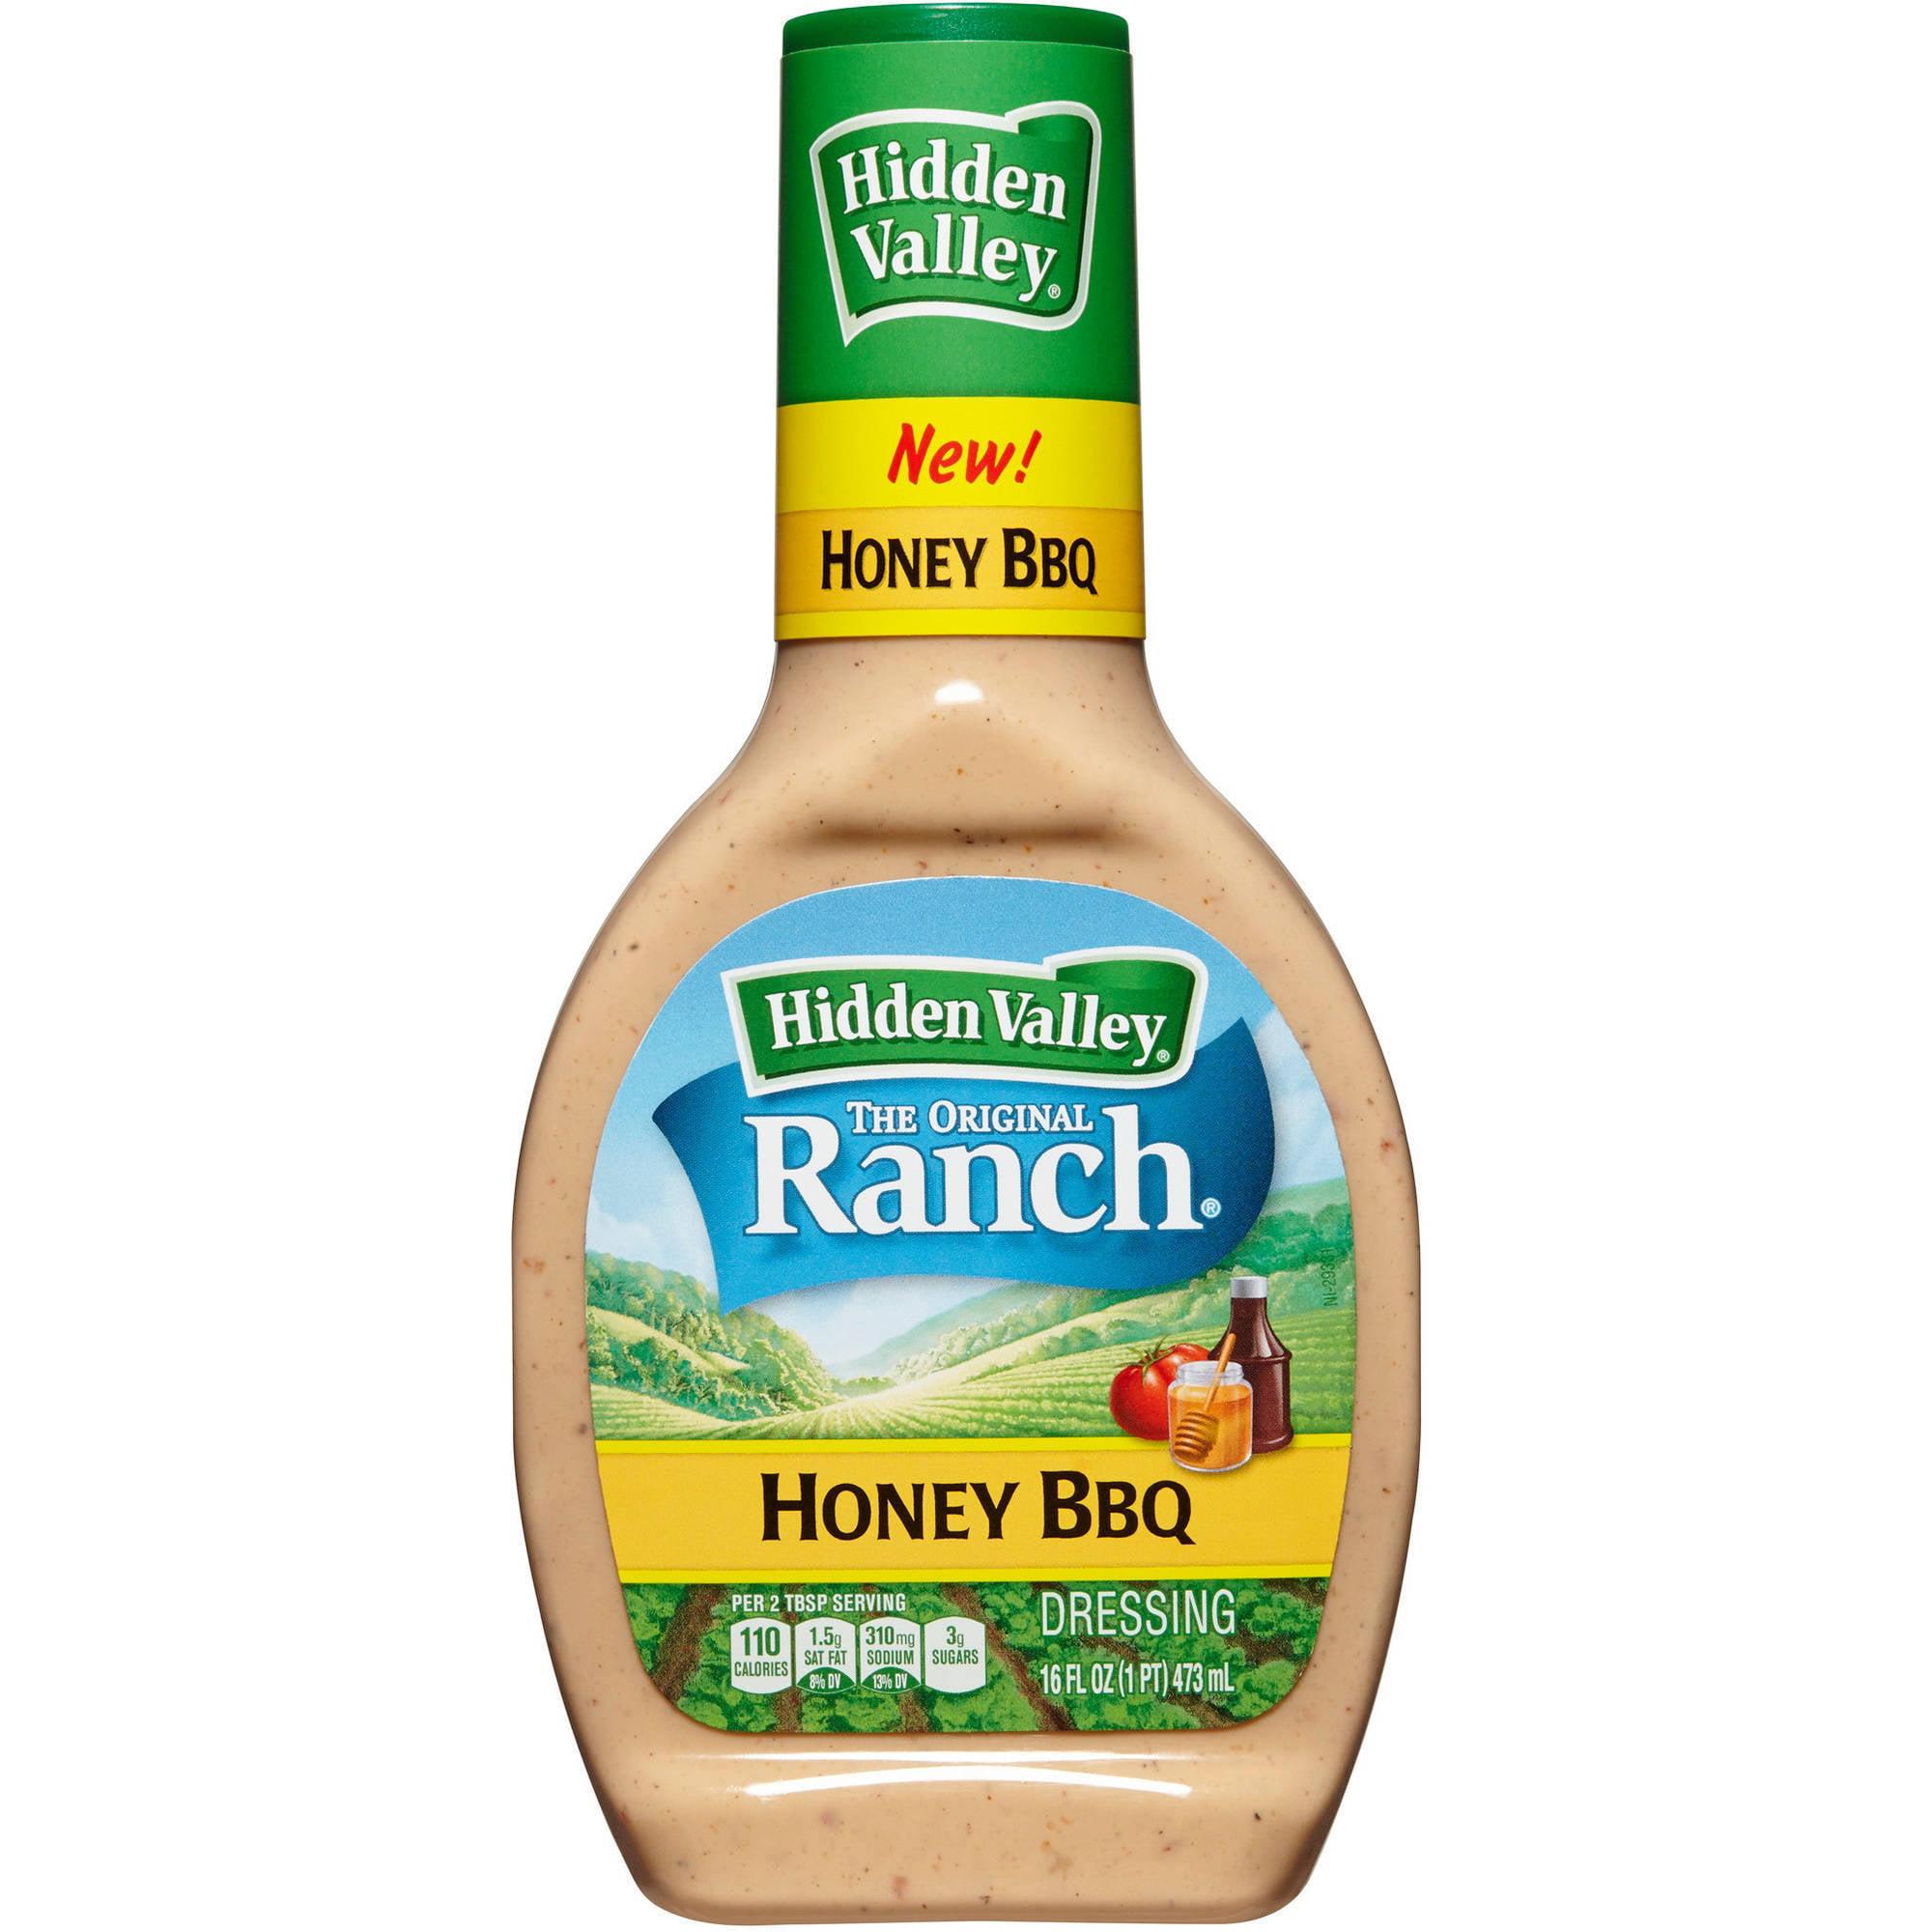 Hidden Valley The Original Ranch Honey BBQ Dressing, 16 fl oz